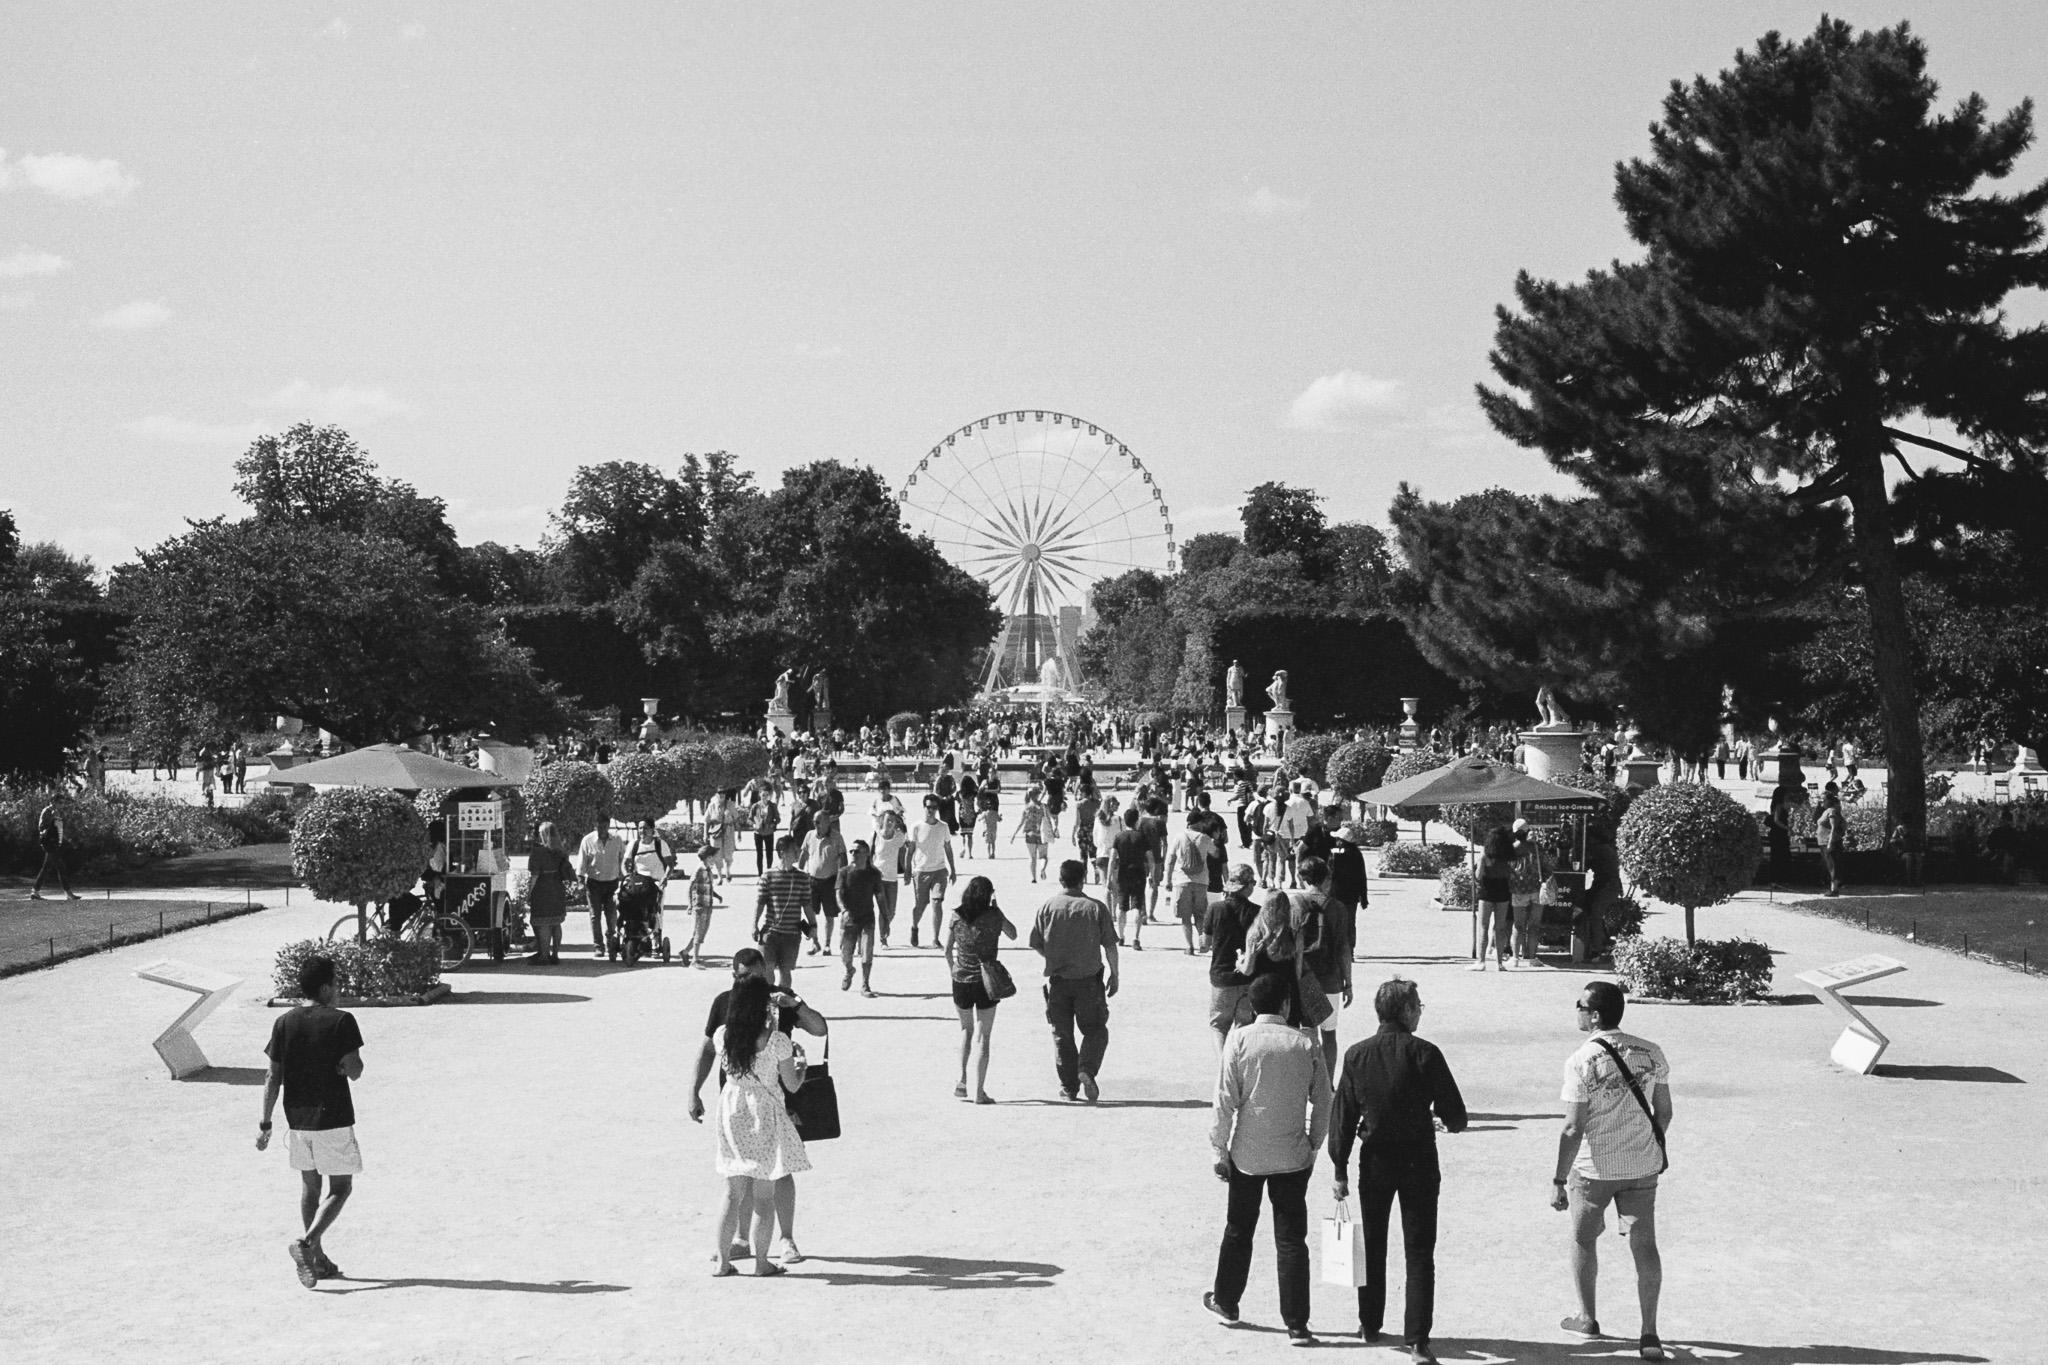 Nikon-F3-Paris-018.jpg